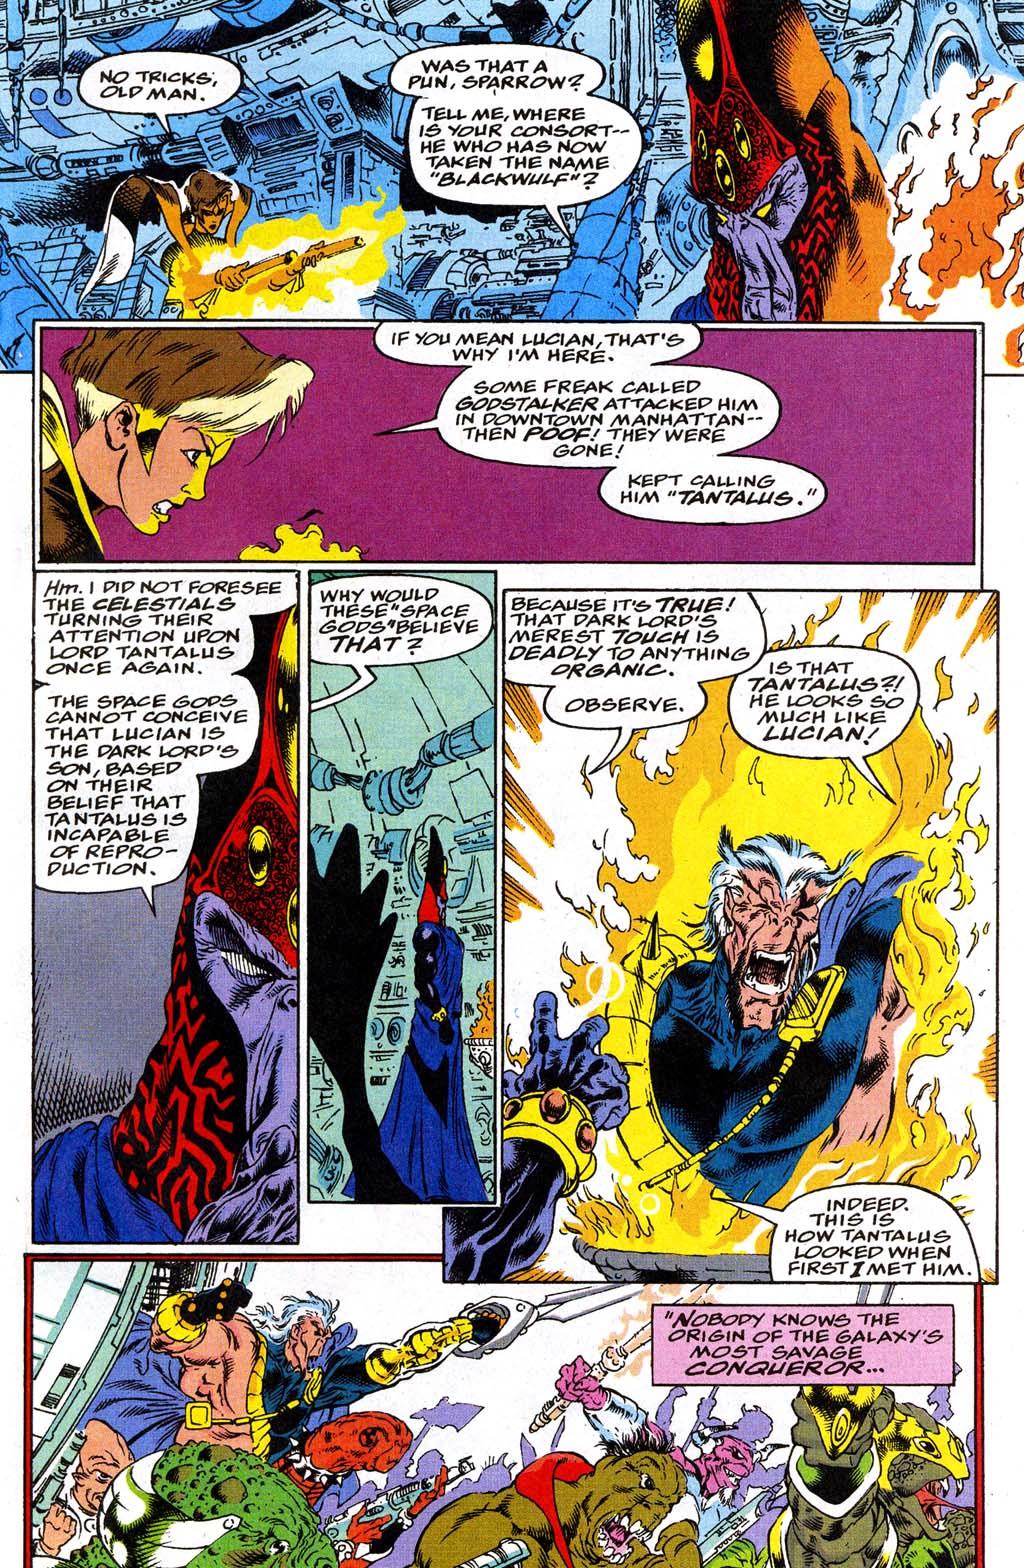 Read online Blackwulf comic -  Issue #9 - 12